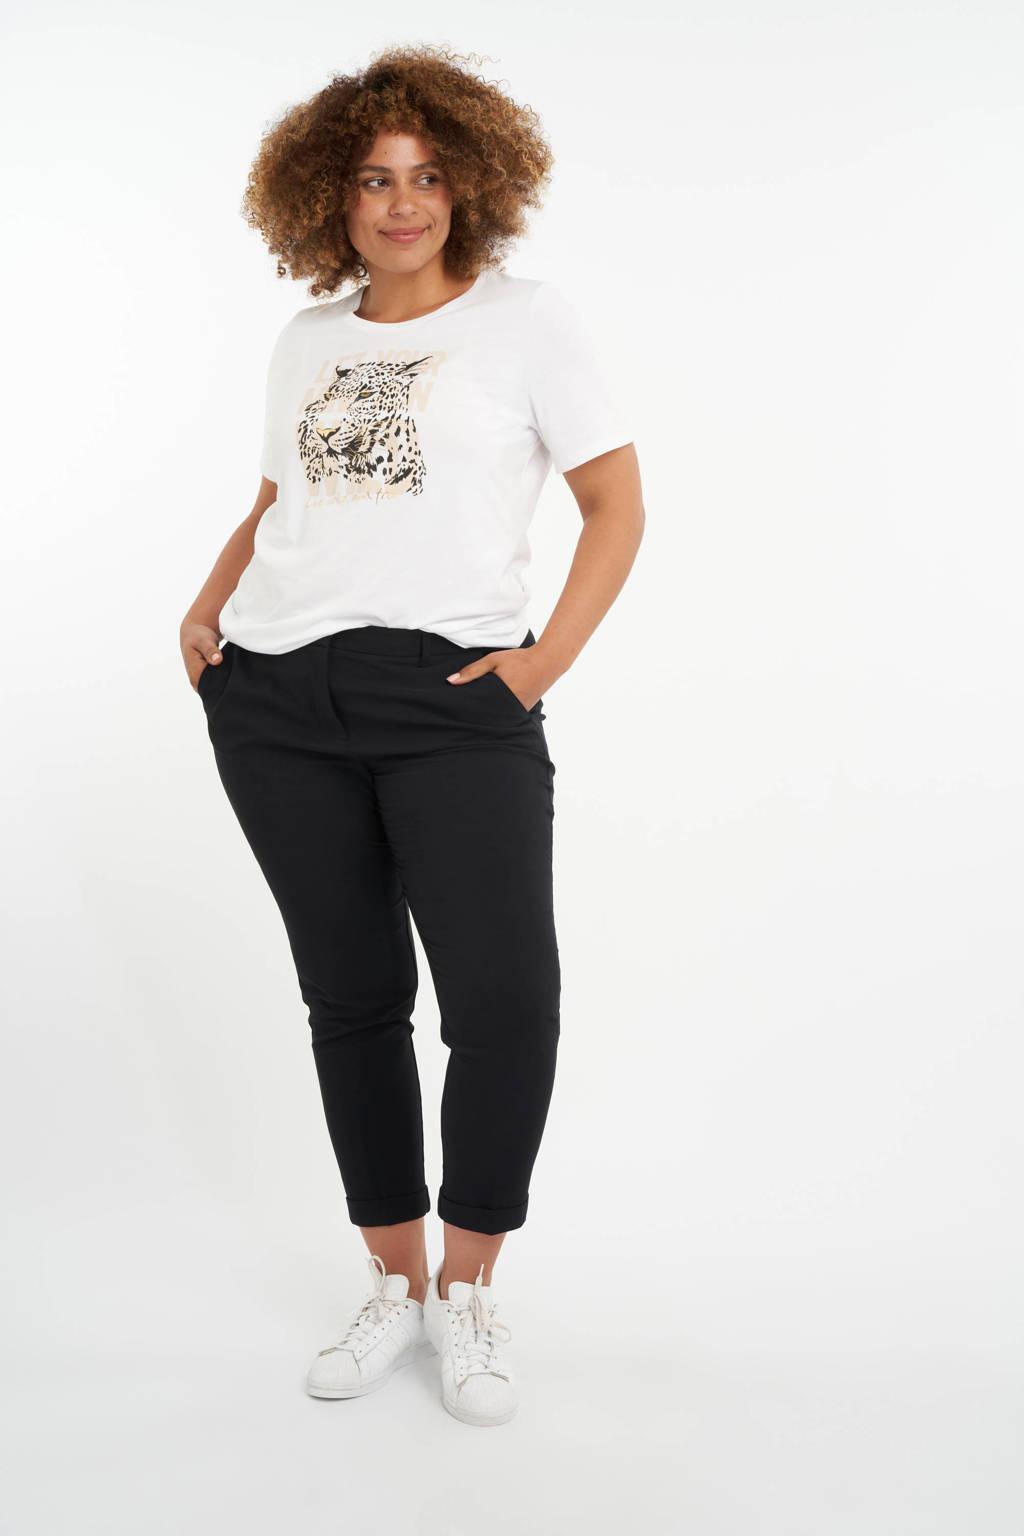 MS Mode T-shirt met printopdruk wit/ecru/zwart, Wit/ecru/zwart